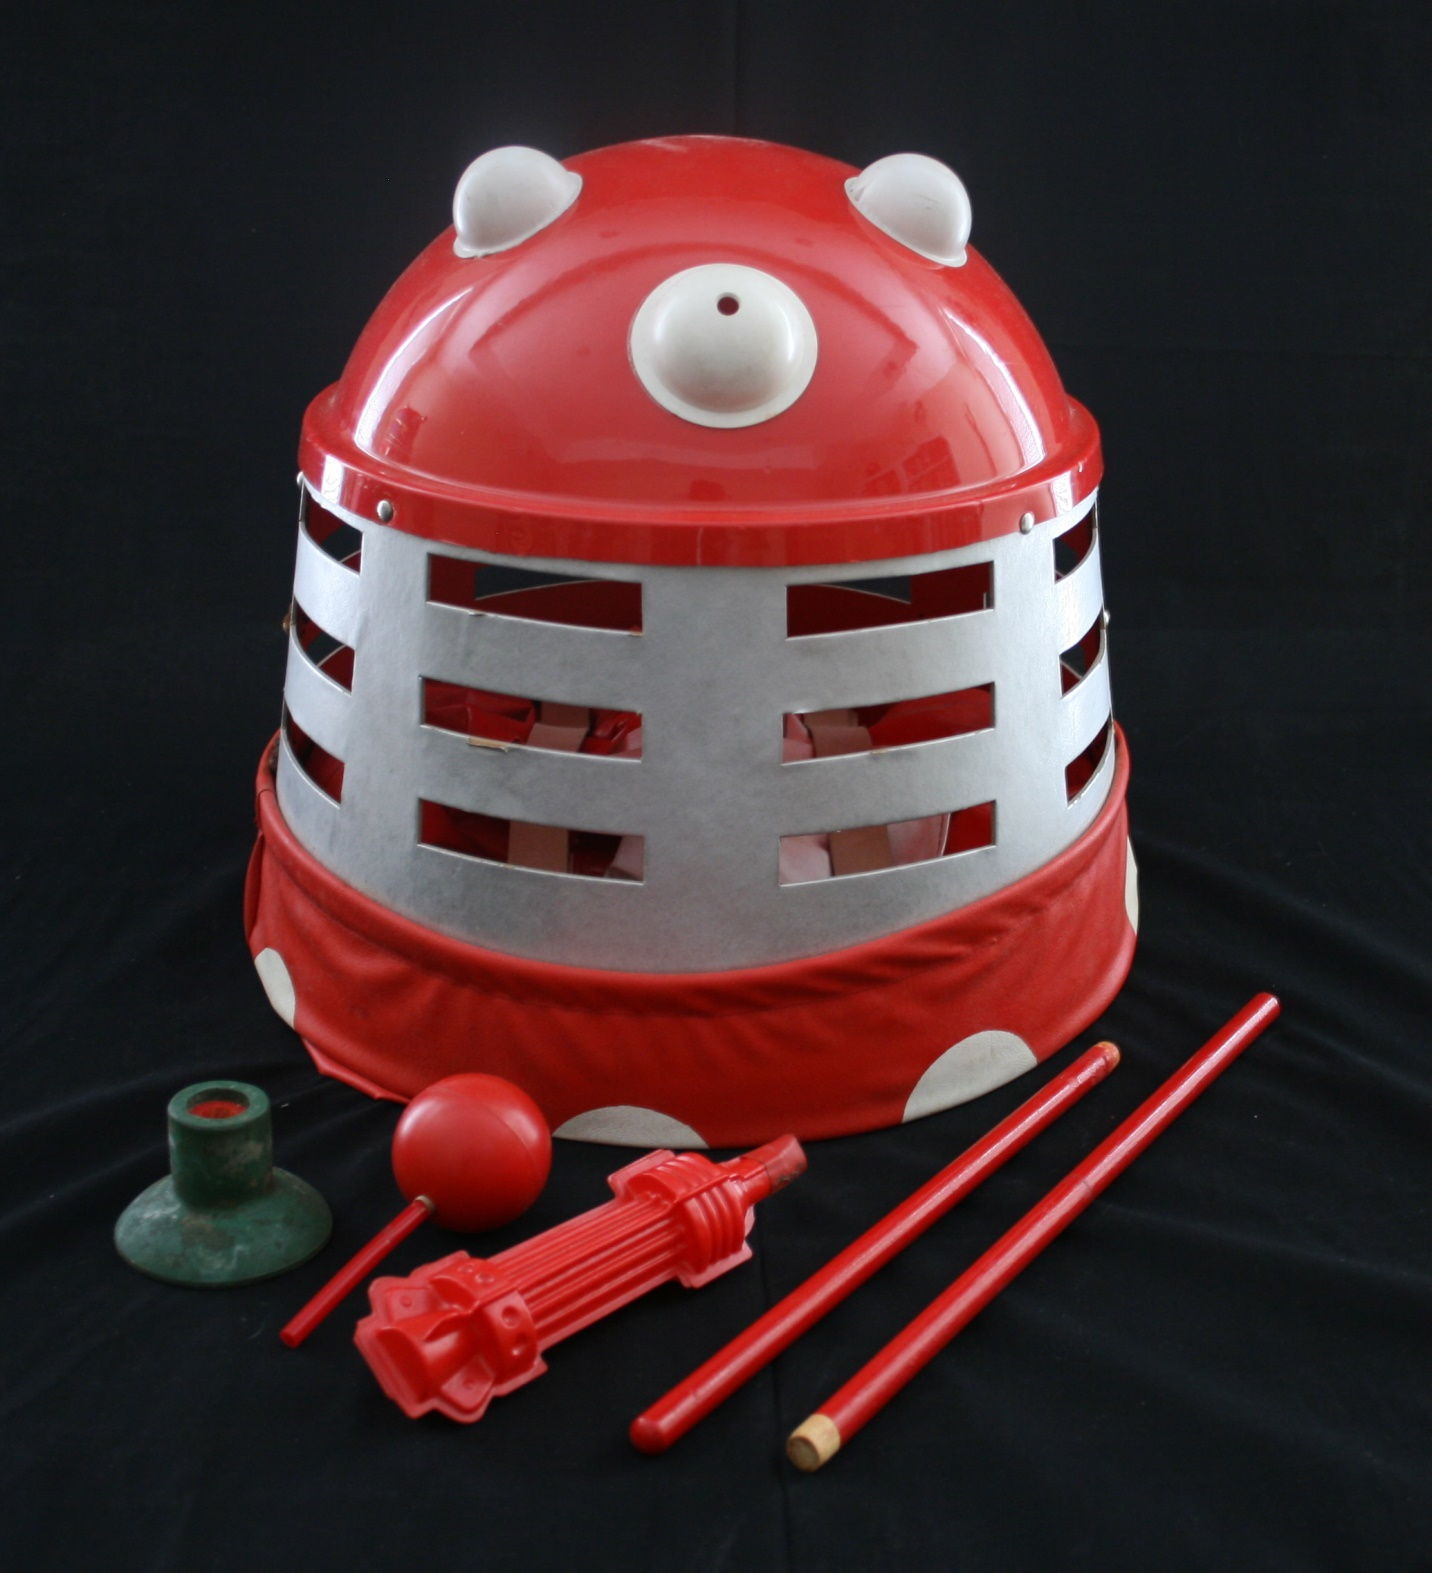 Berwick's Toy Company Ltd., Dalek Playsuit